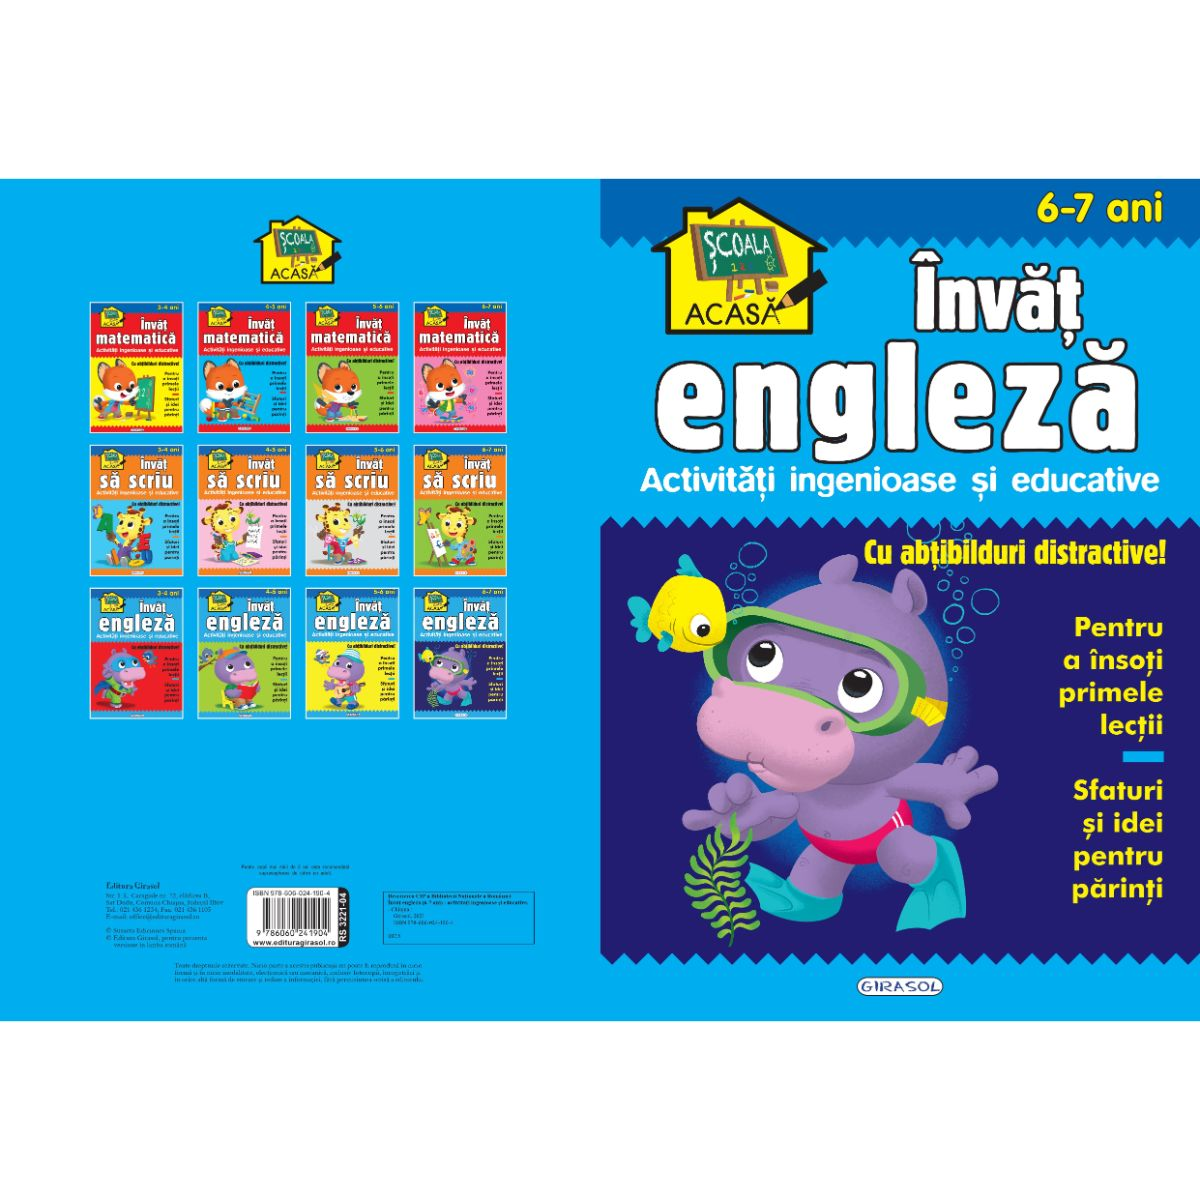 Scoala acasa, Invat engleza, 6-7 ani